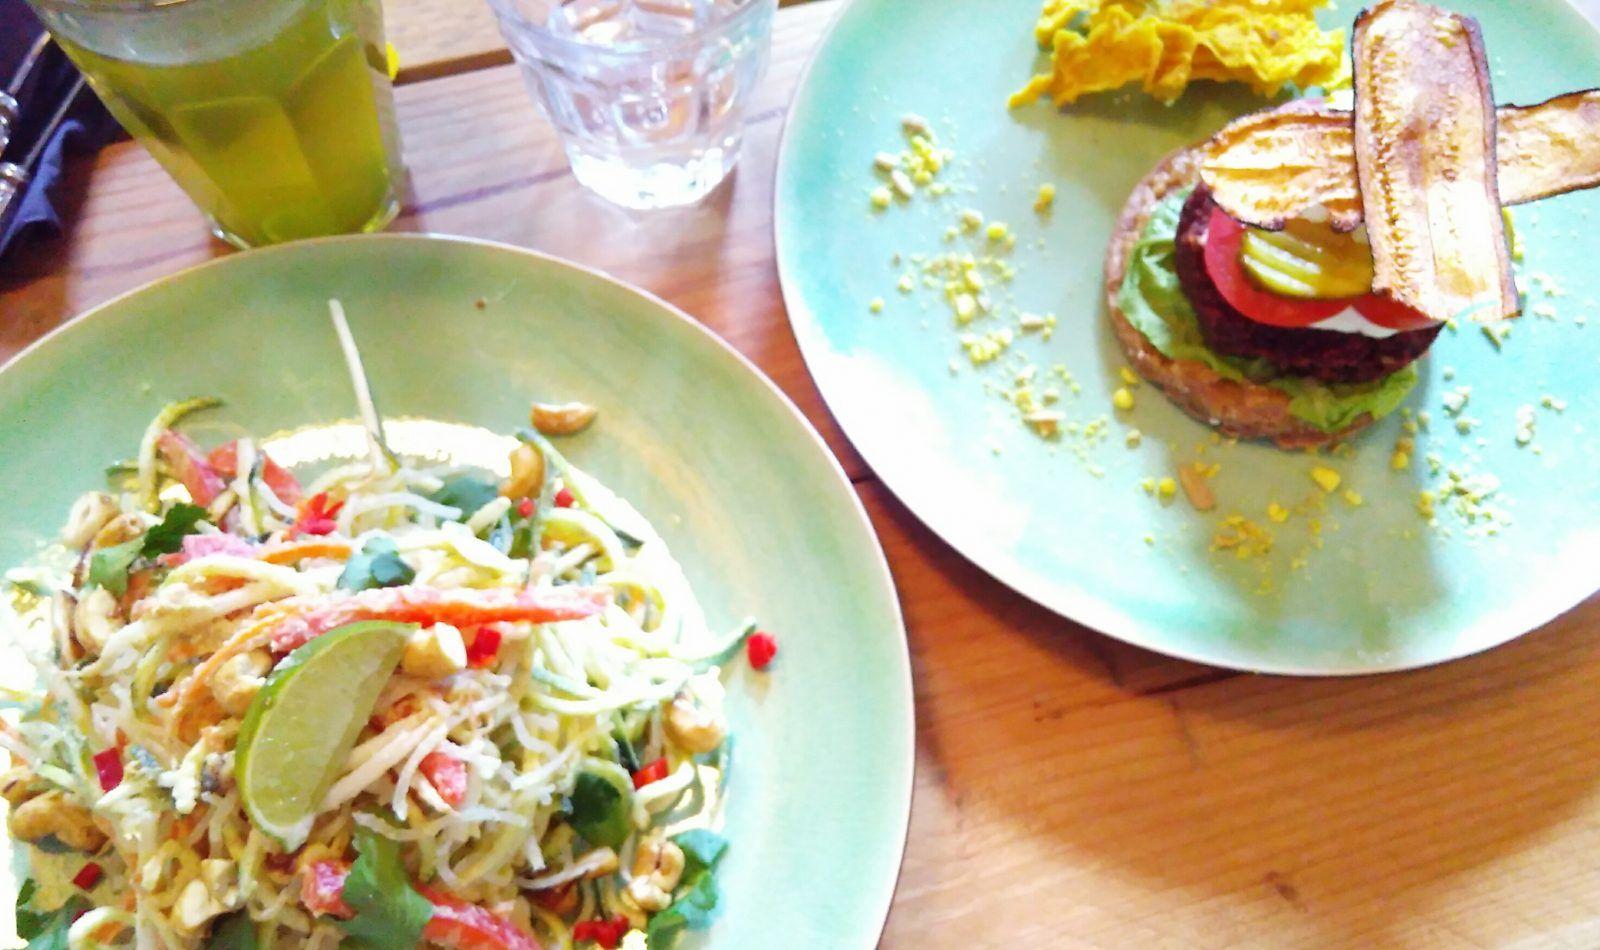 vegan pad thai hamburger zest for life amsterdam raw food cafe